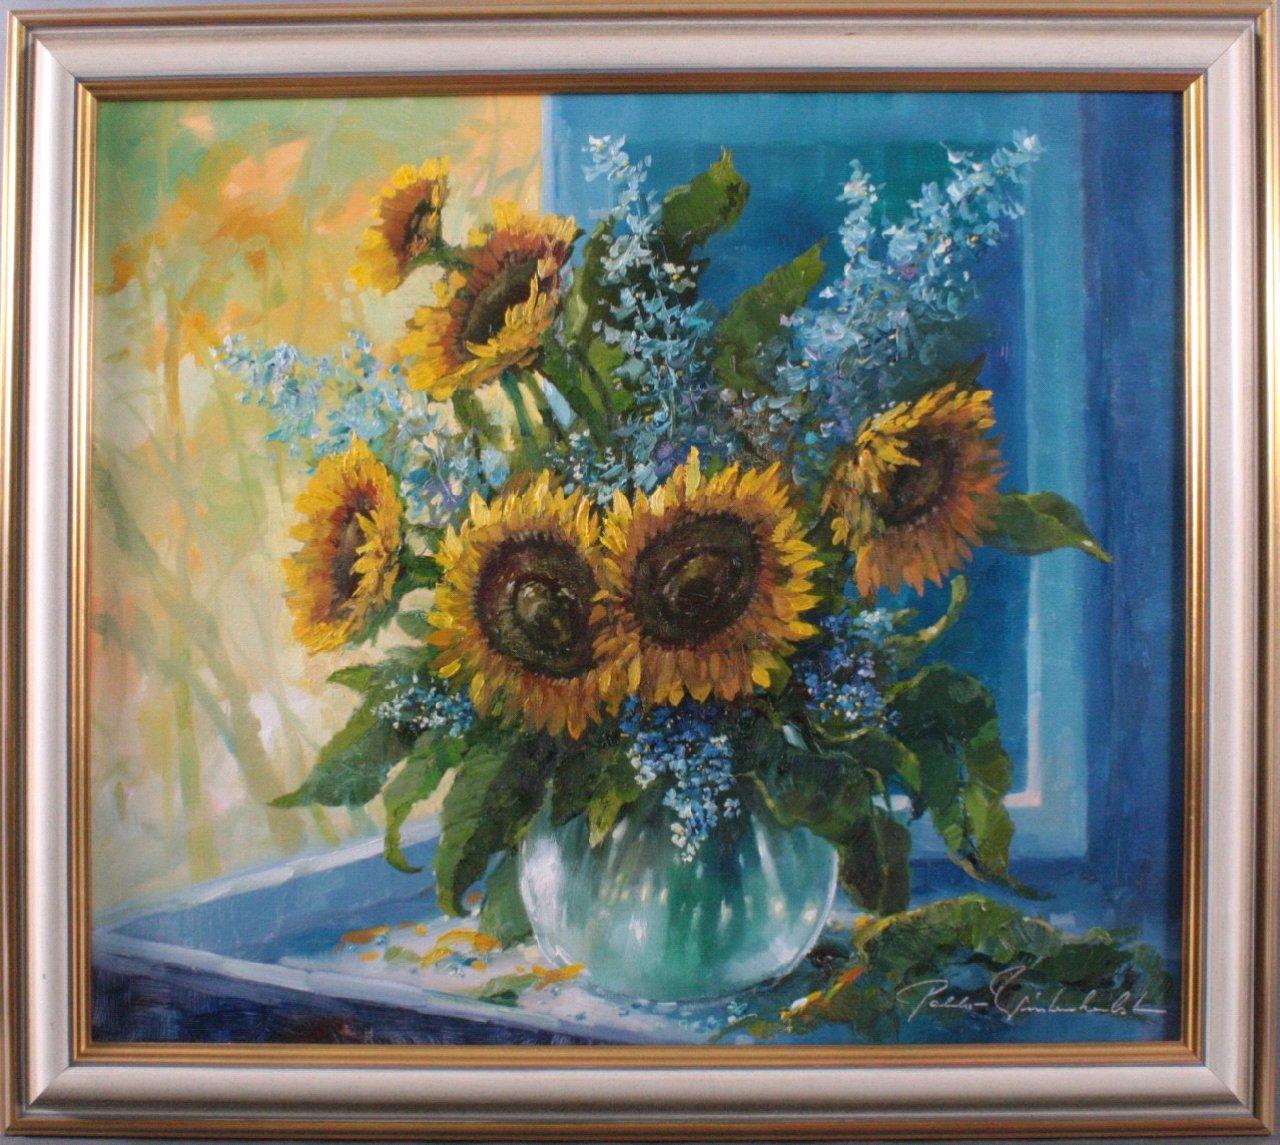 Pablo E. Winterherbst (1939-?), Sonnenblumen